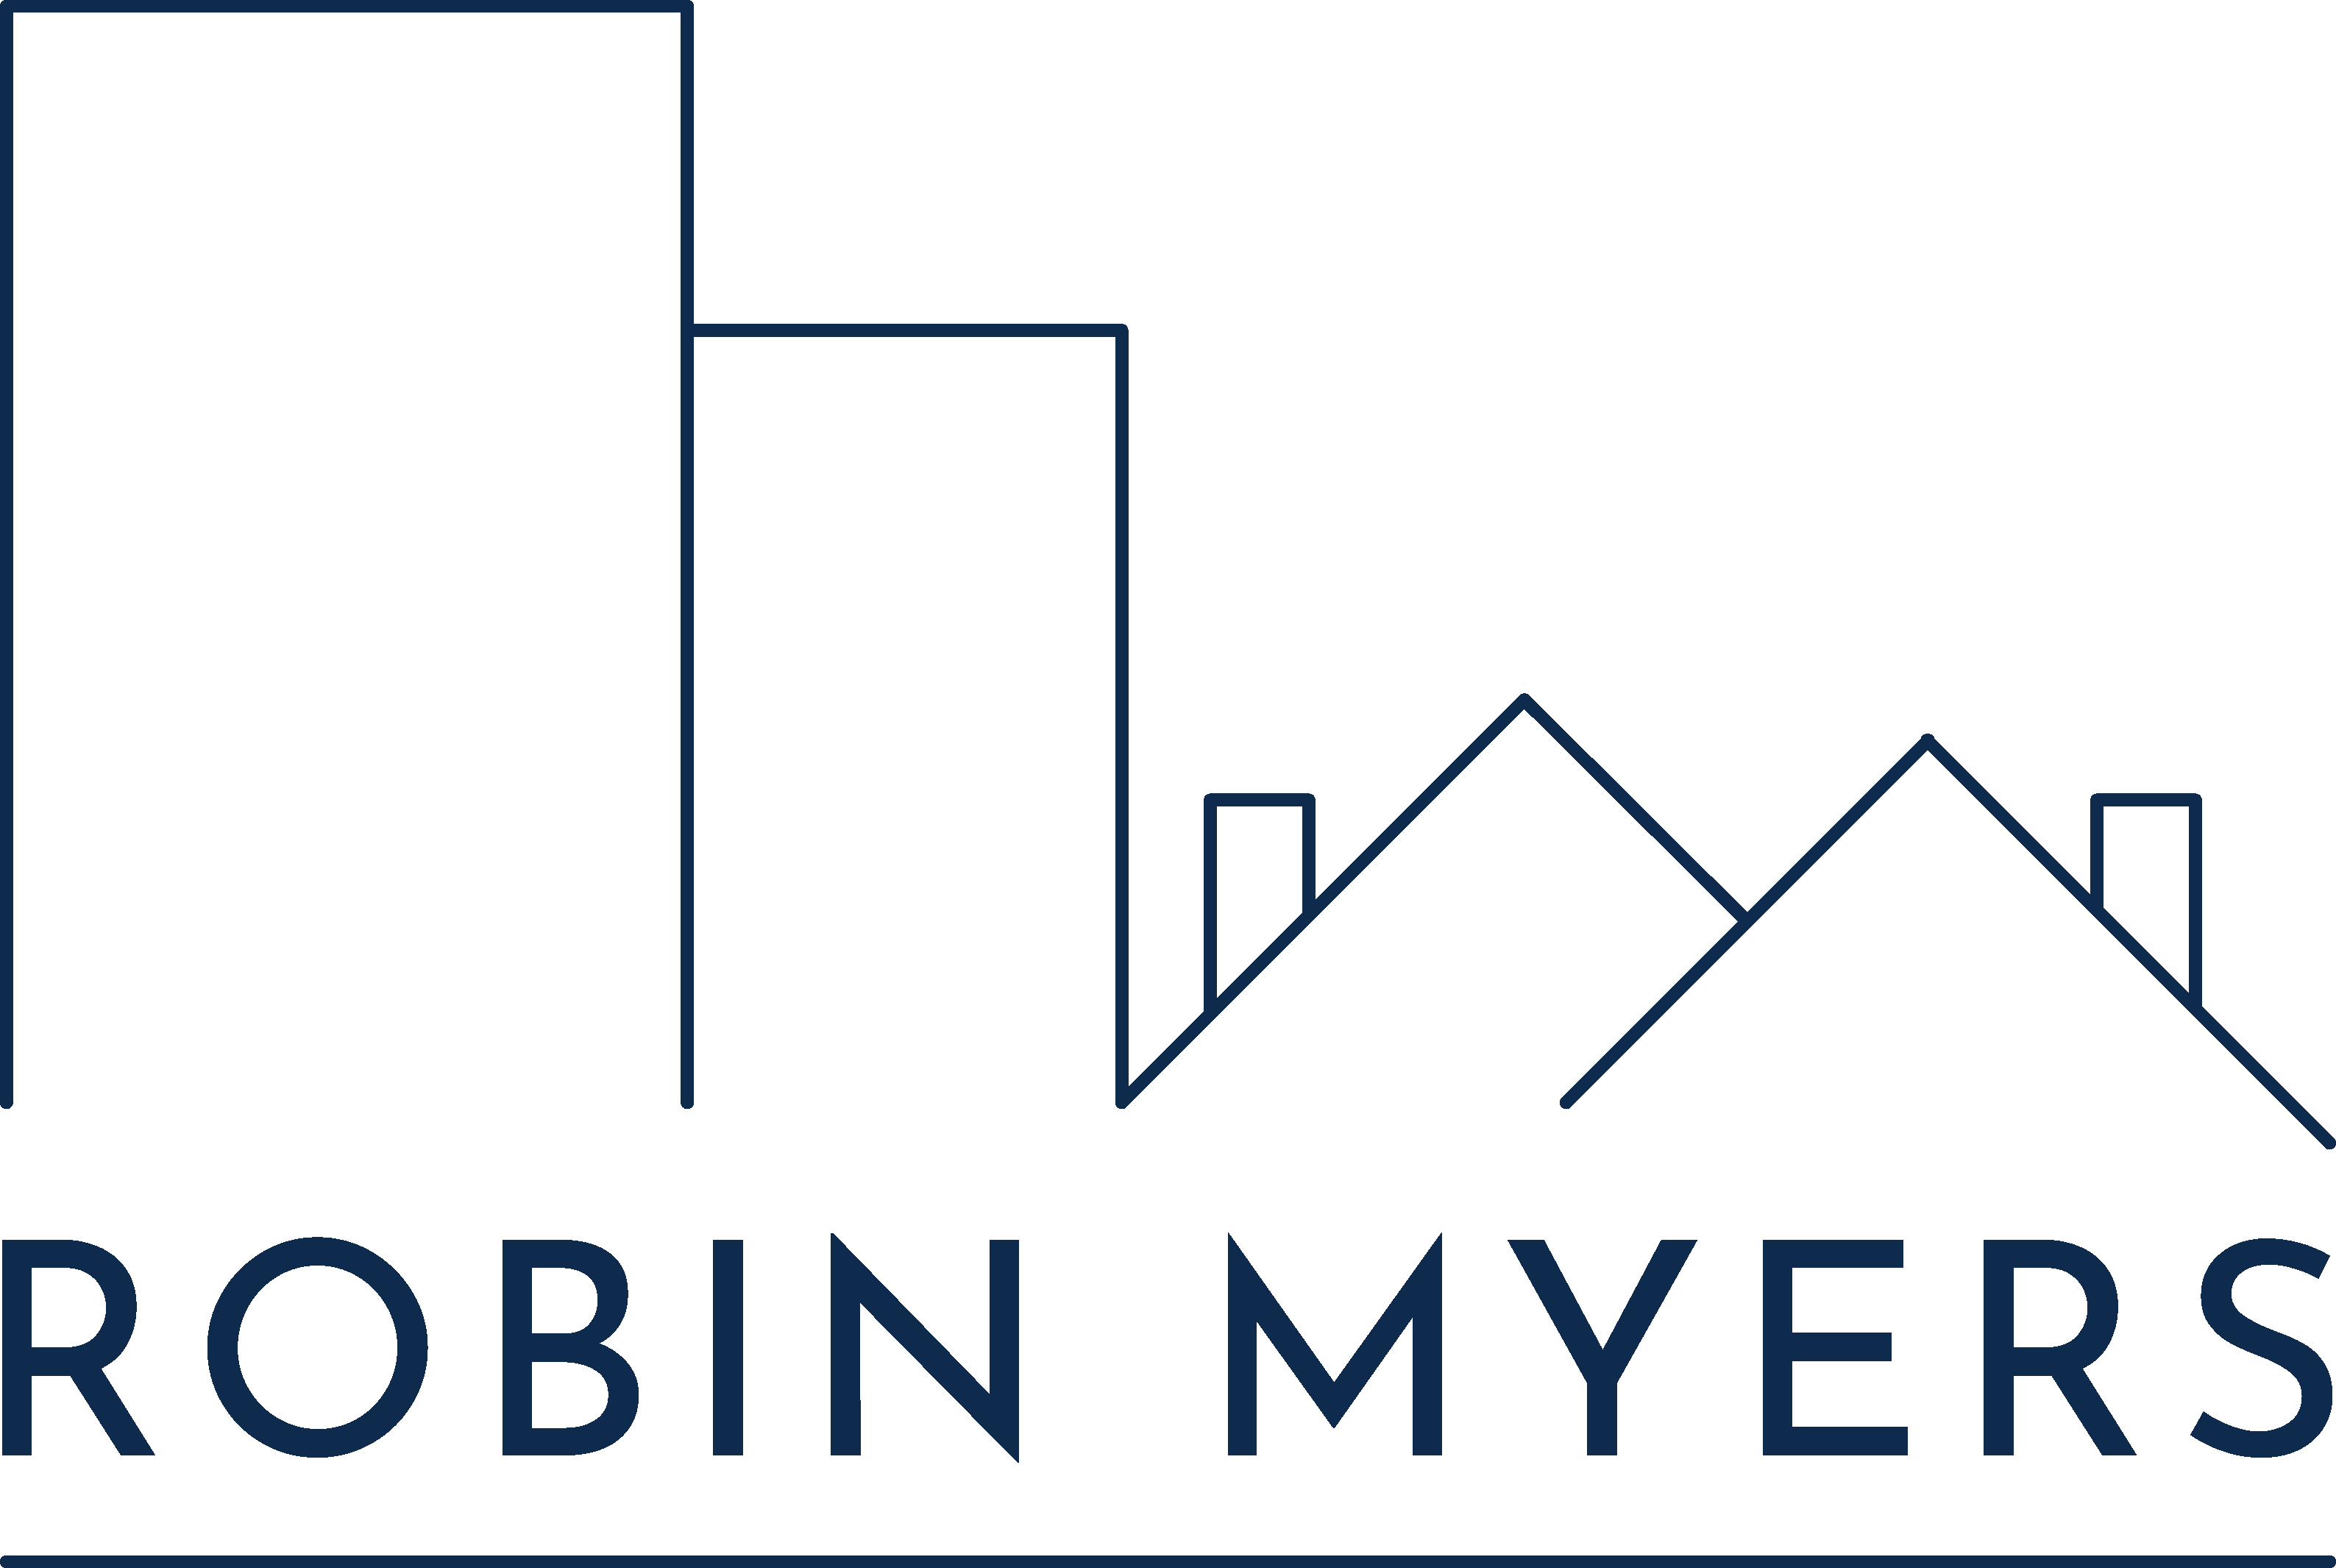 RobinMyers_logo_Blue